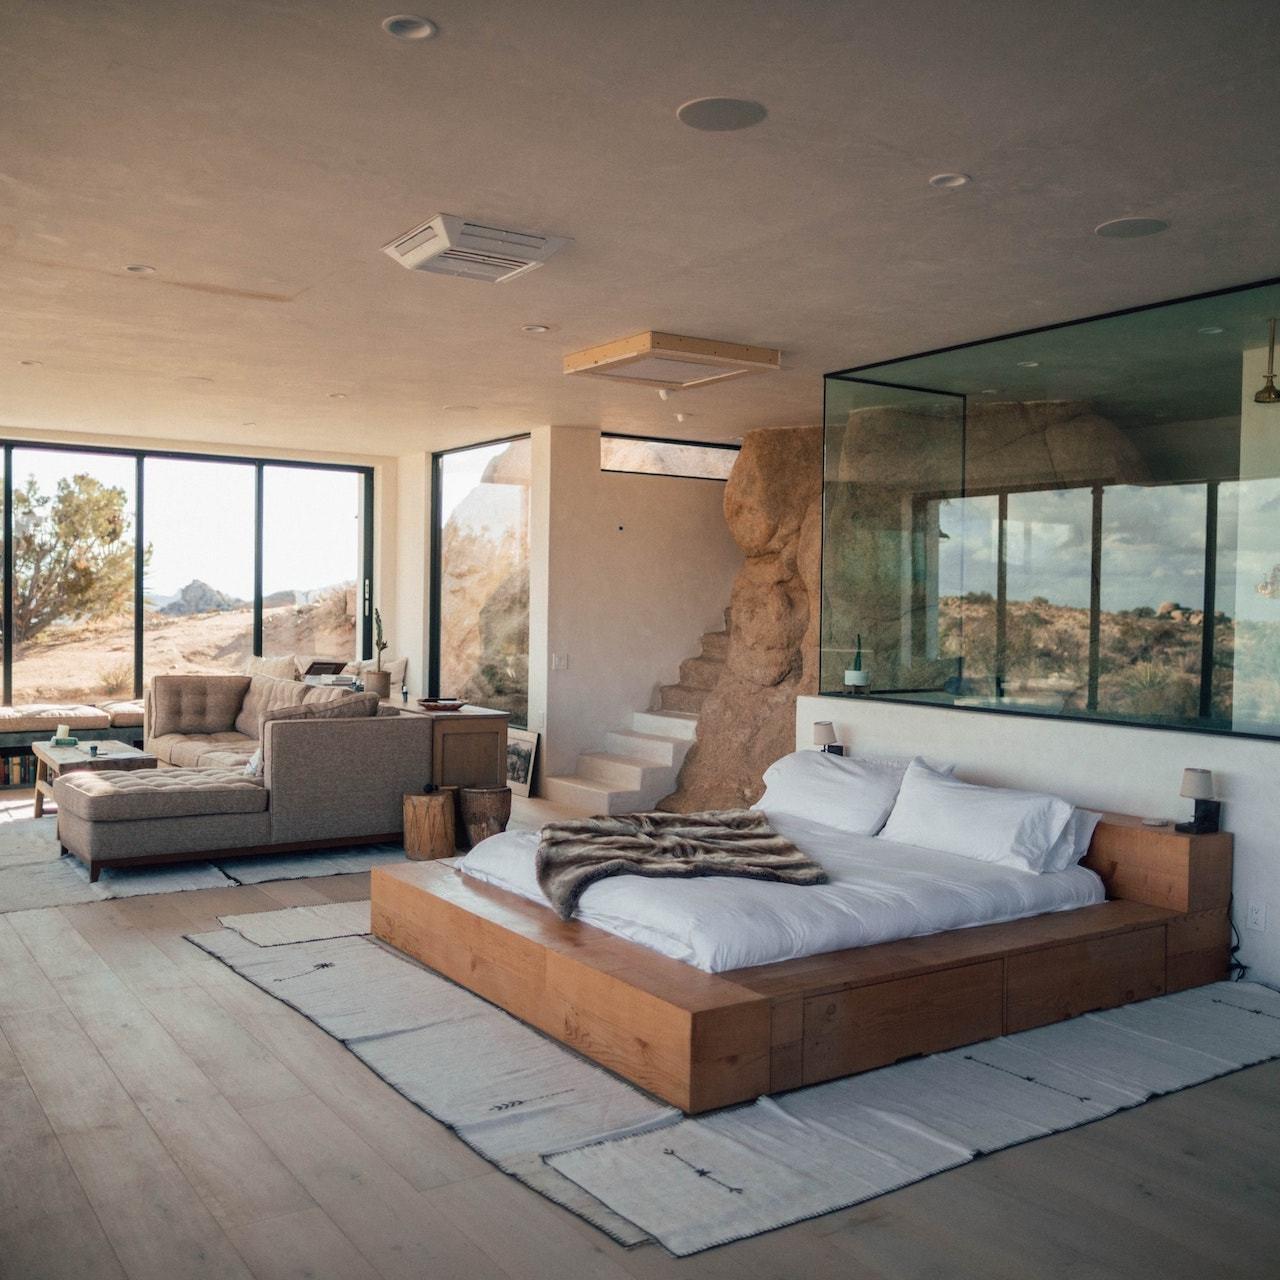 image of bedroom sleek bed